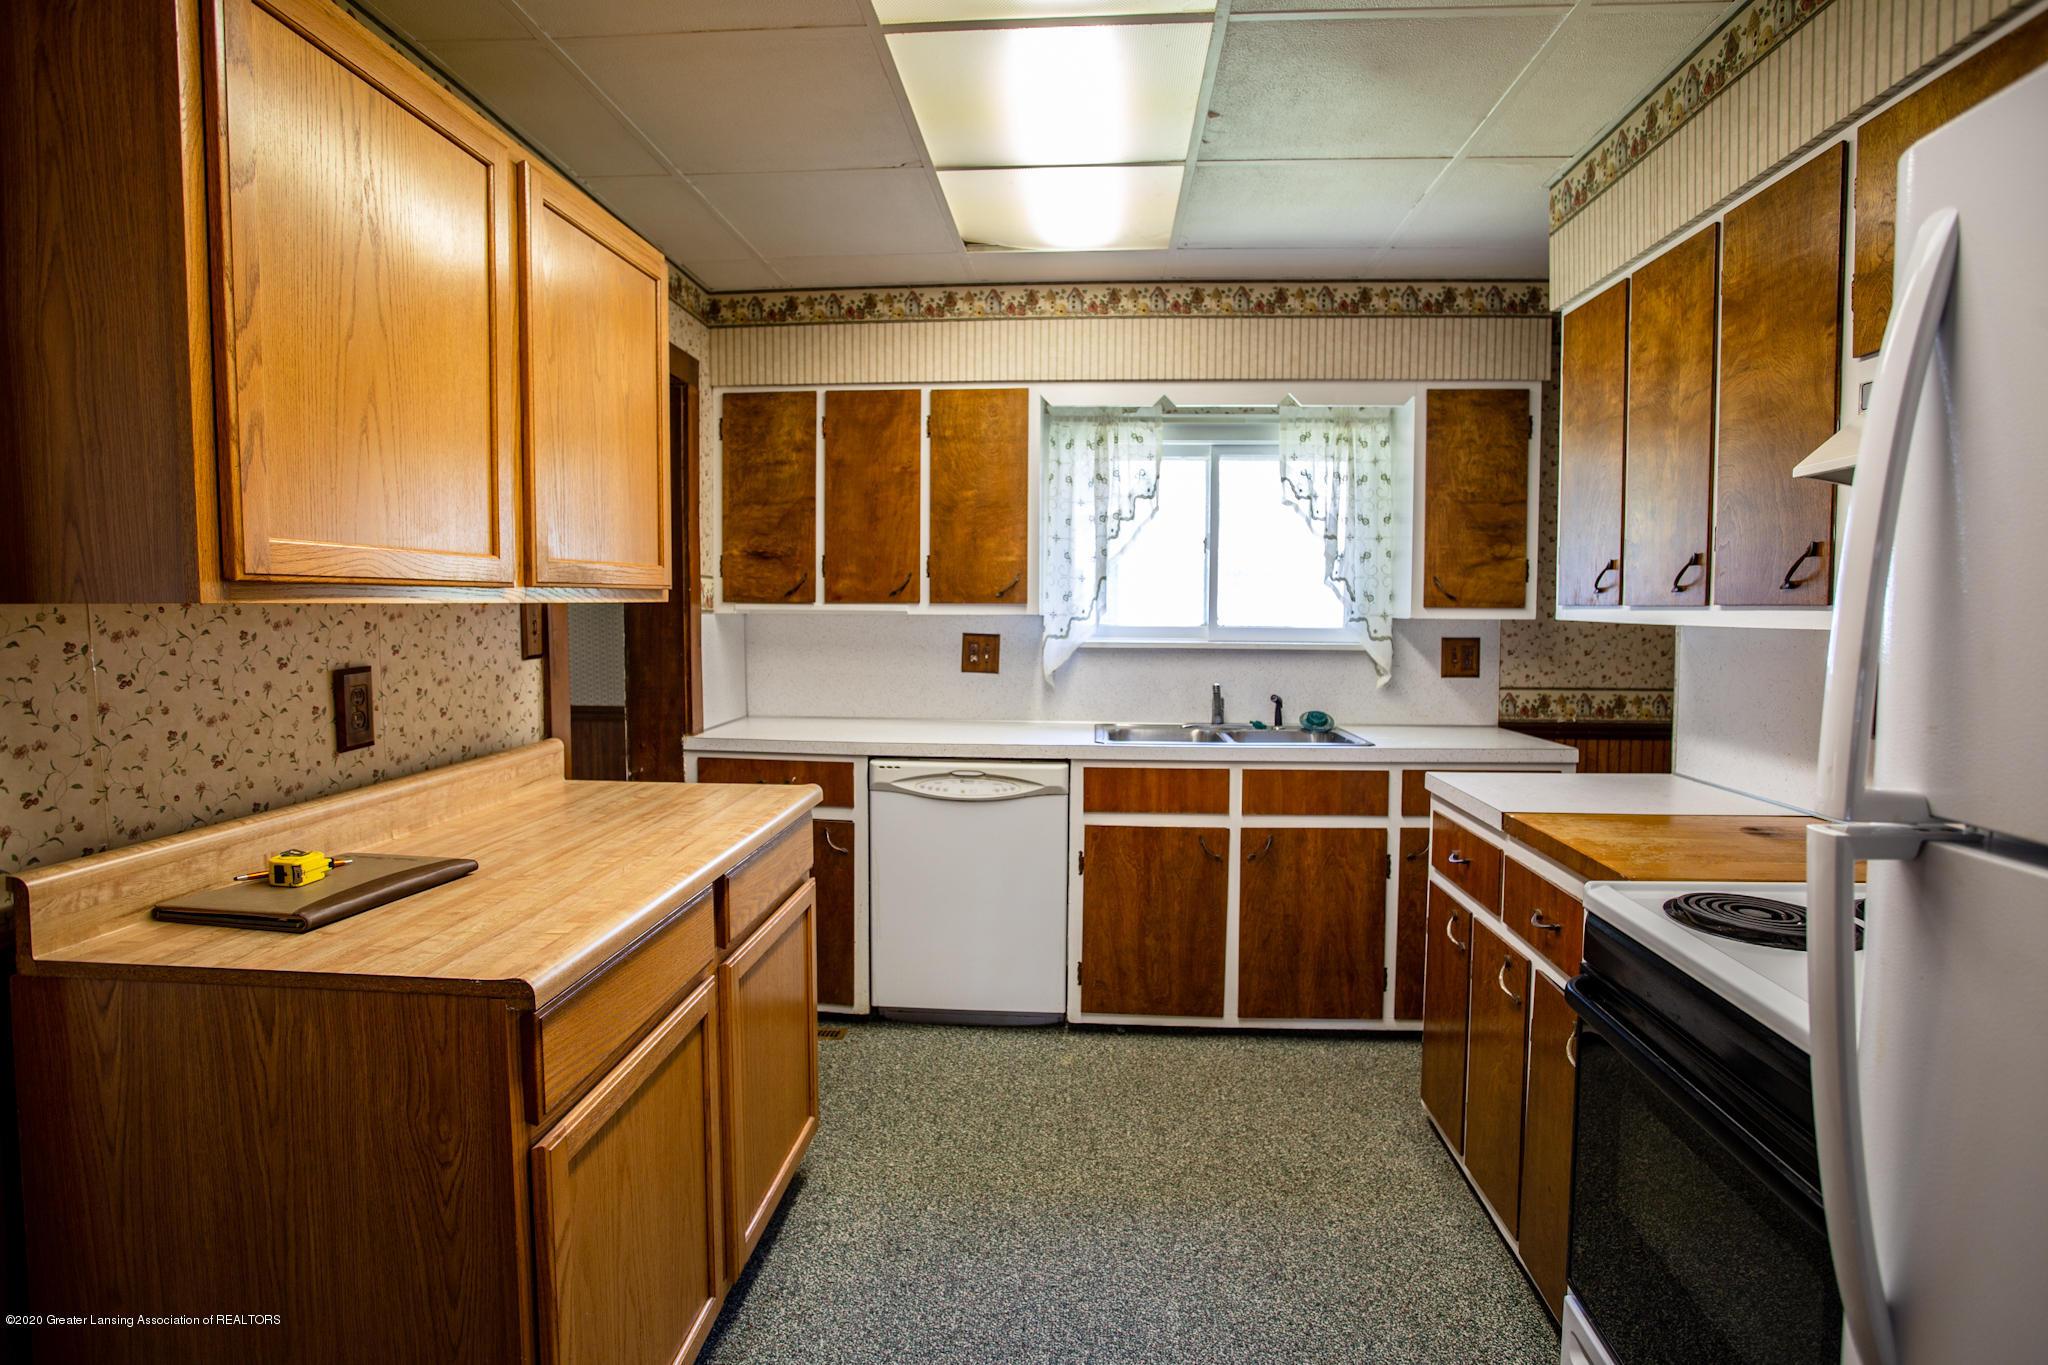 223 W Quincy St - 223 W. Quincy Kitchen 2 - 10